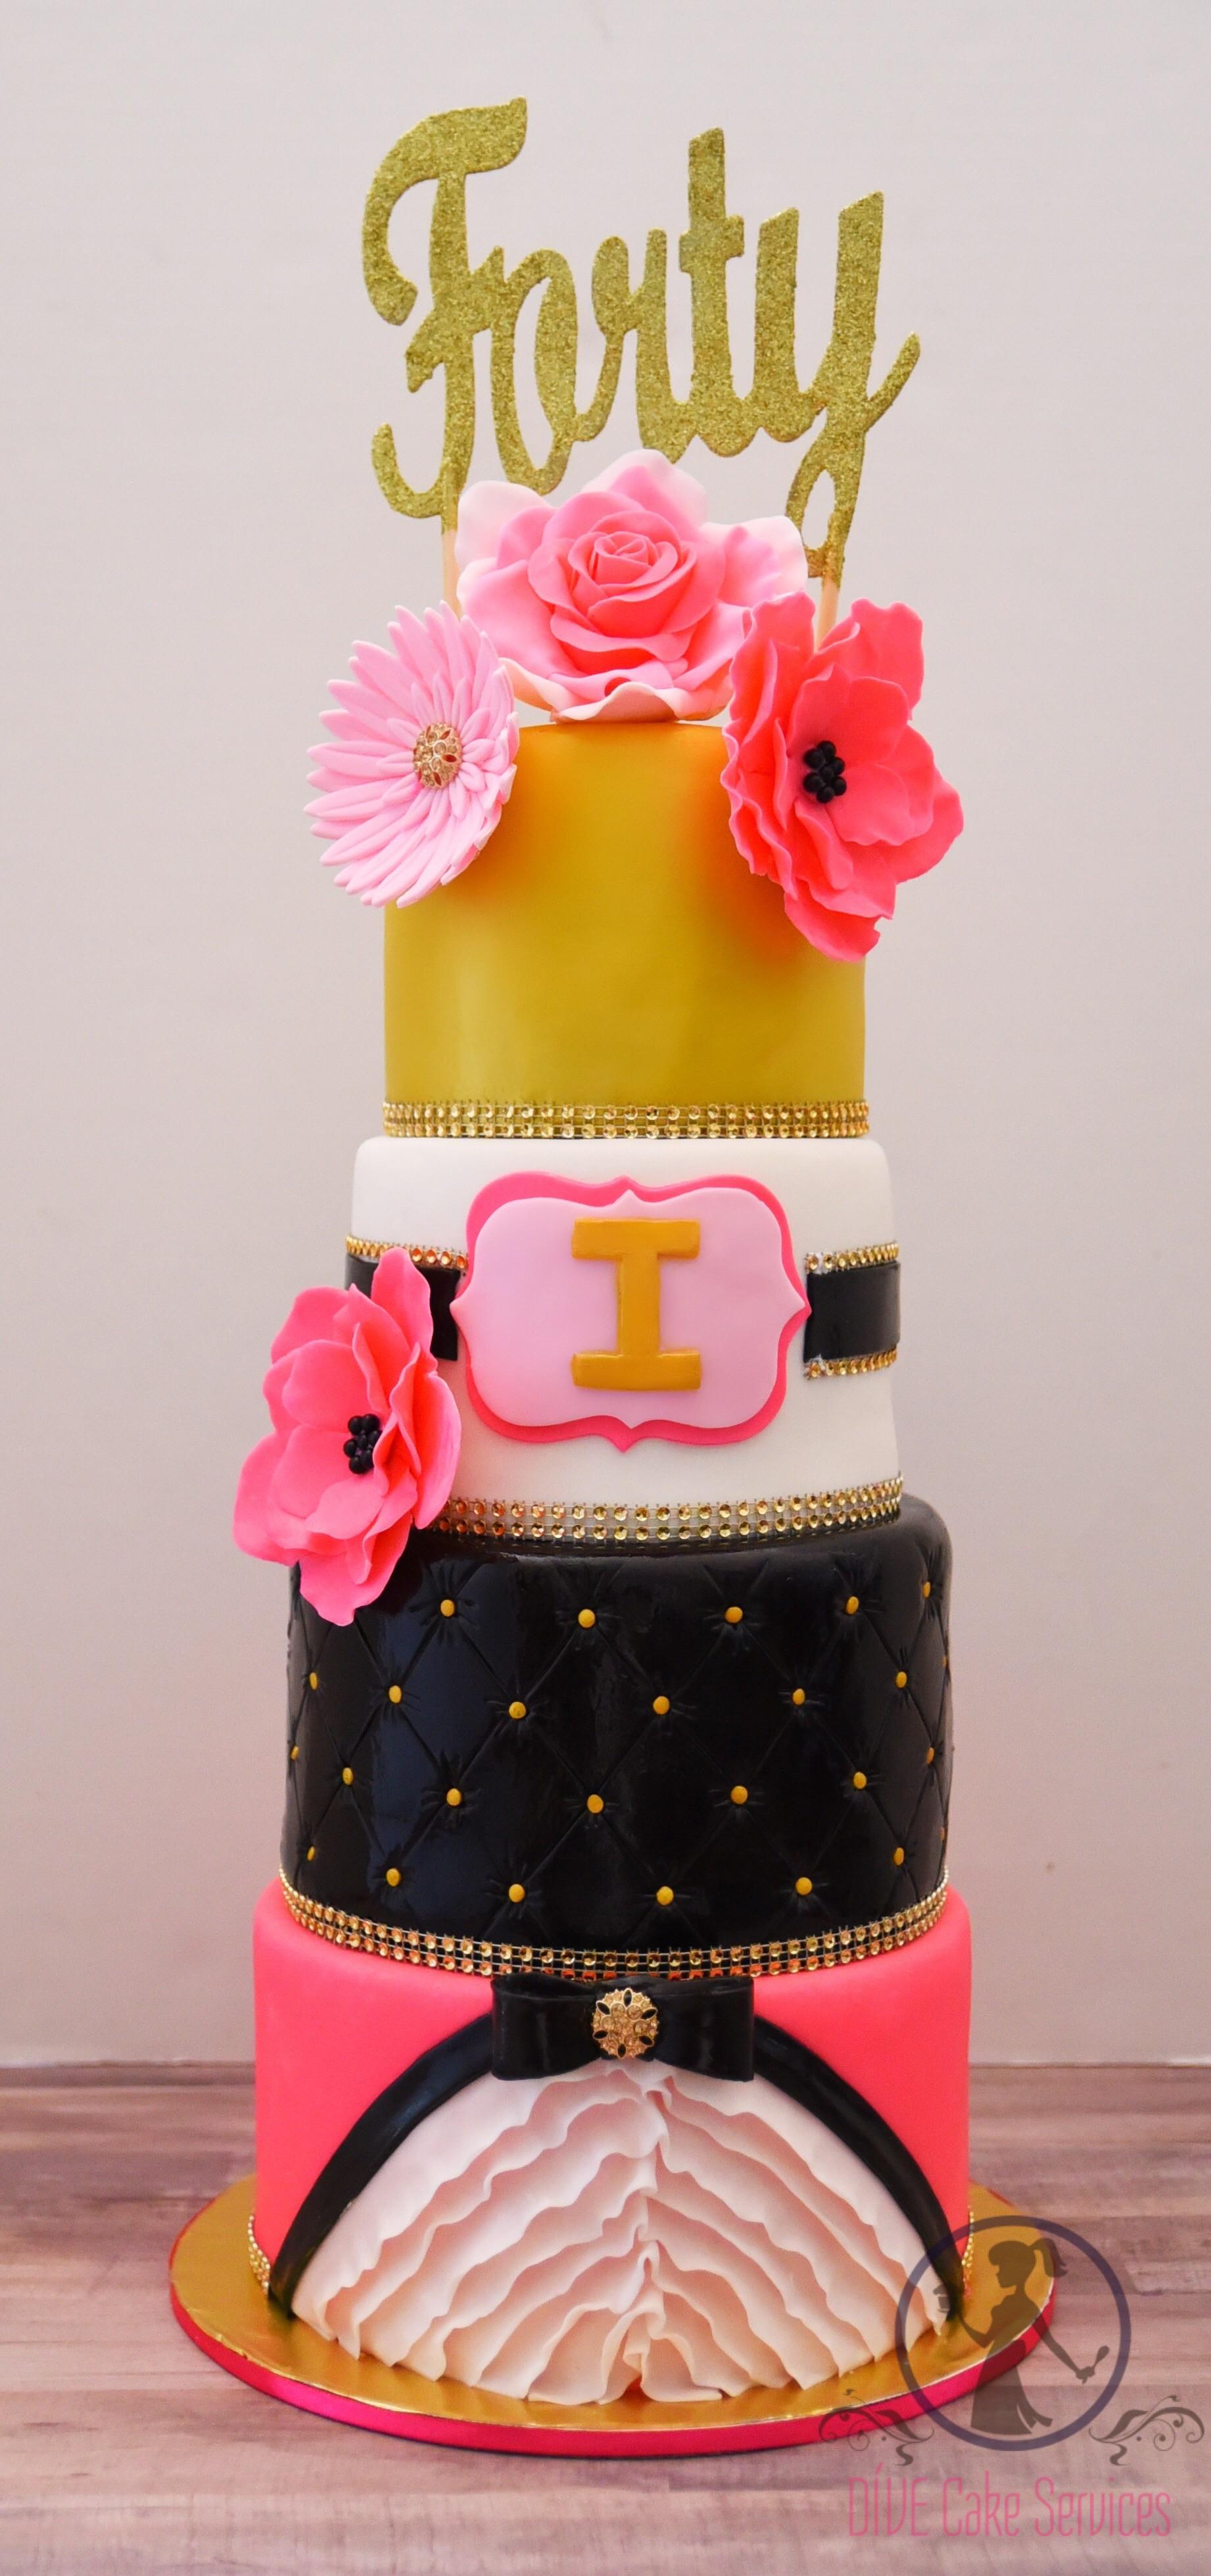 40th elegant cake